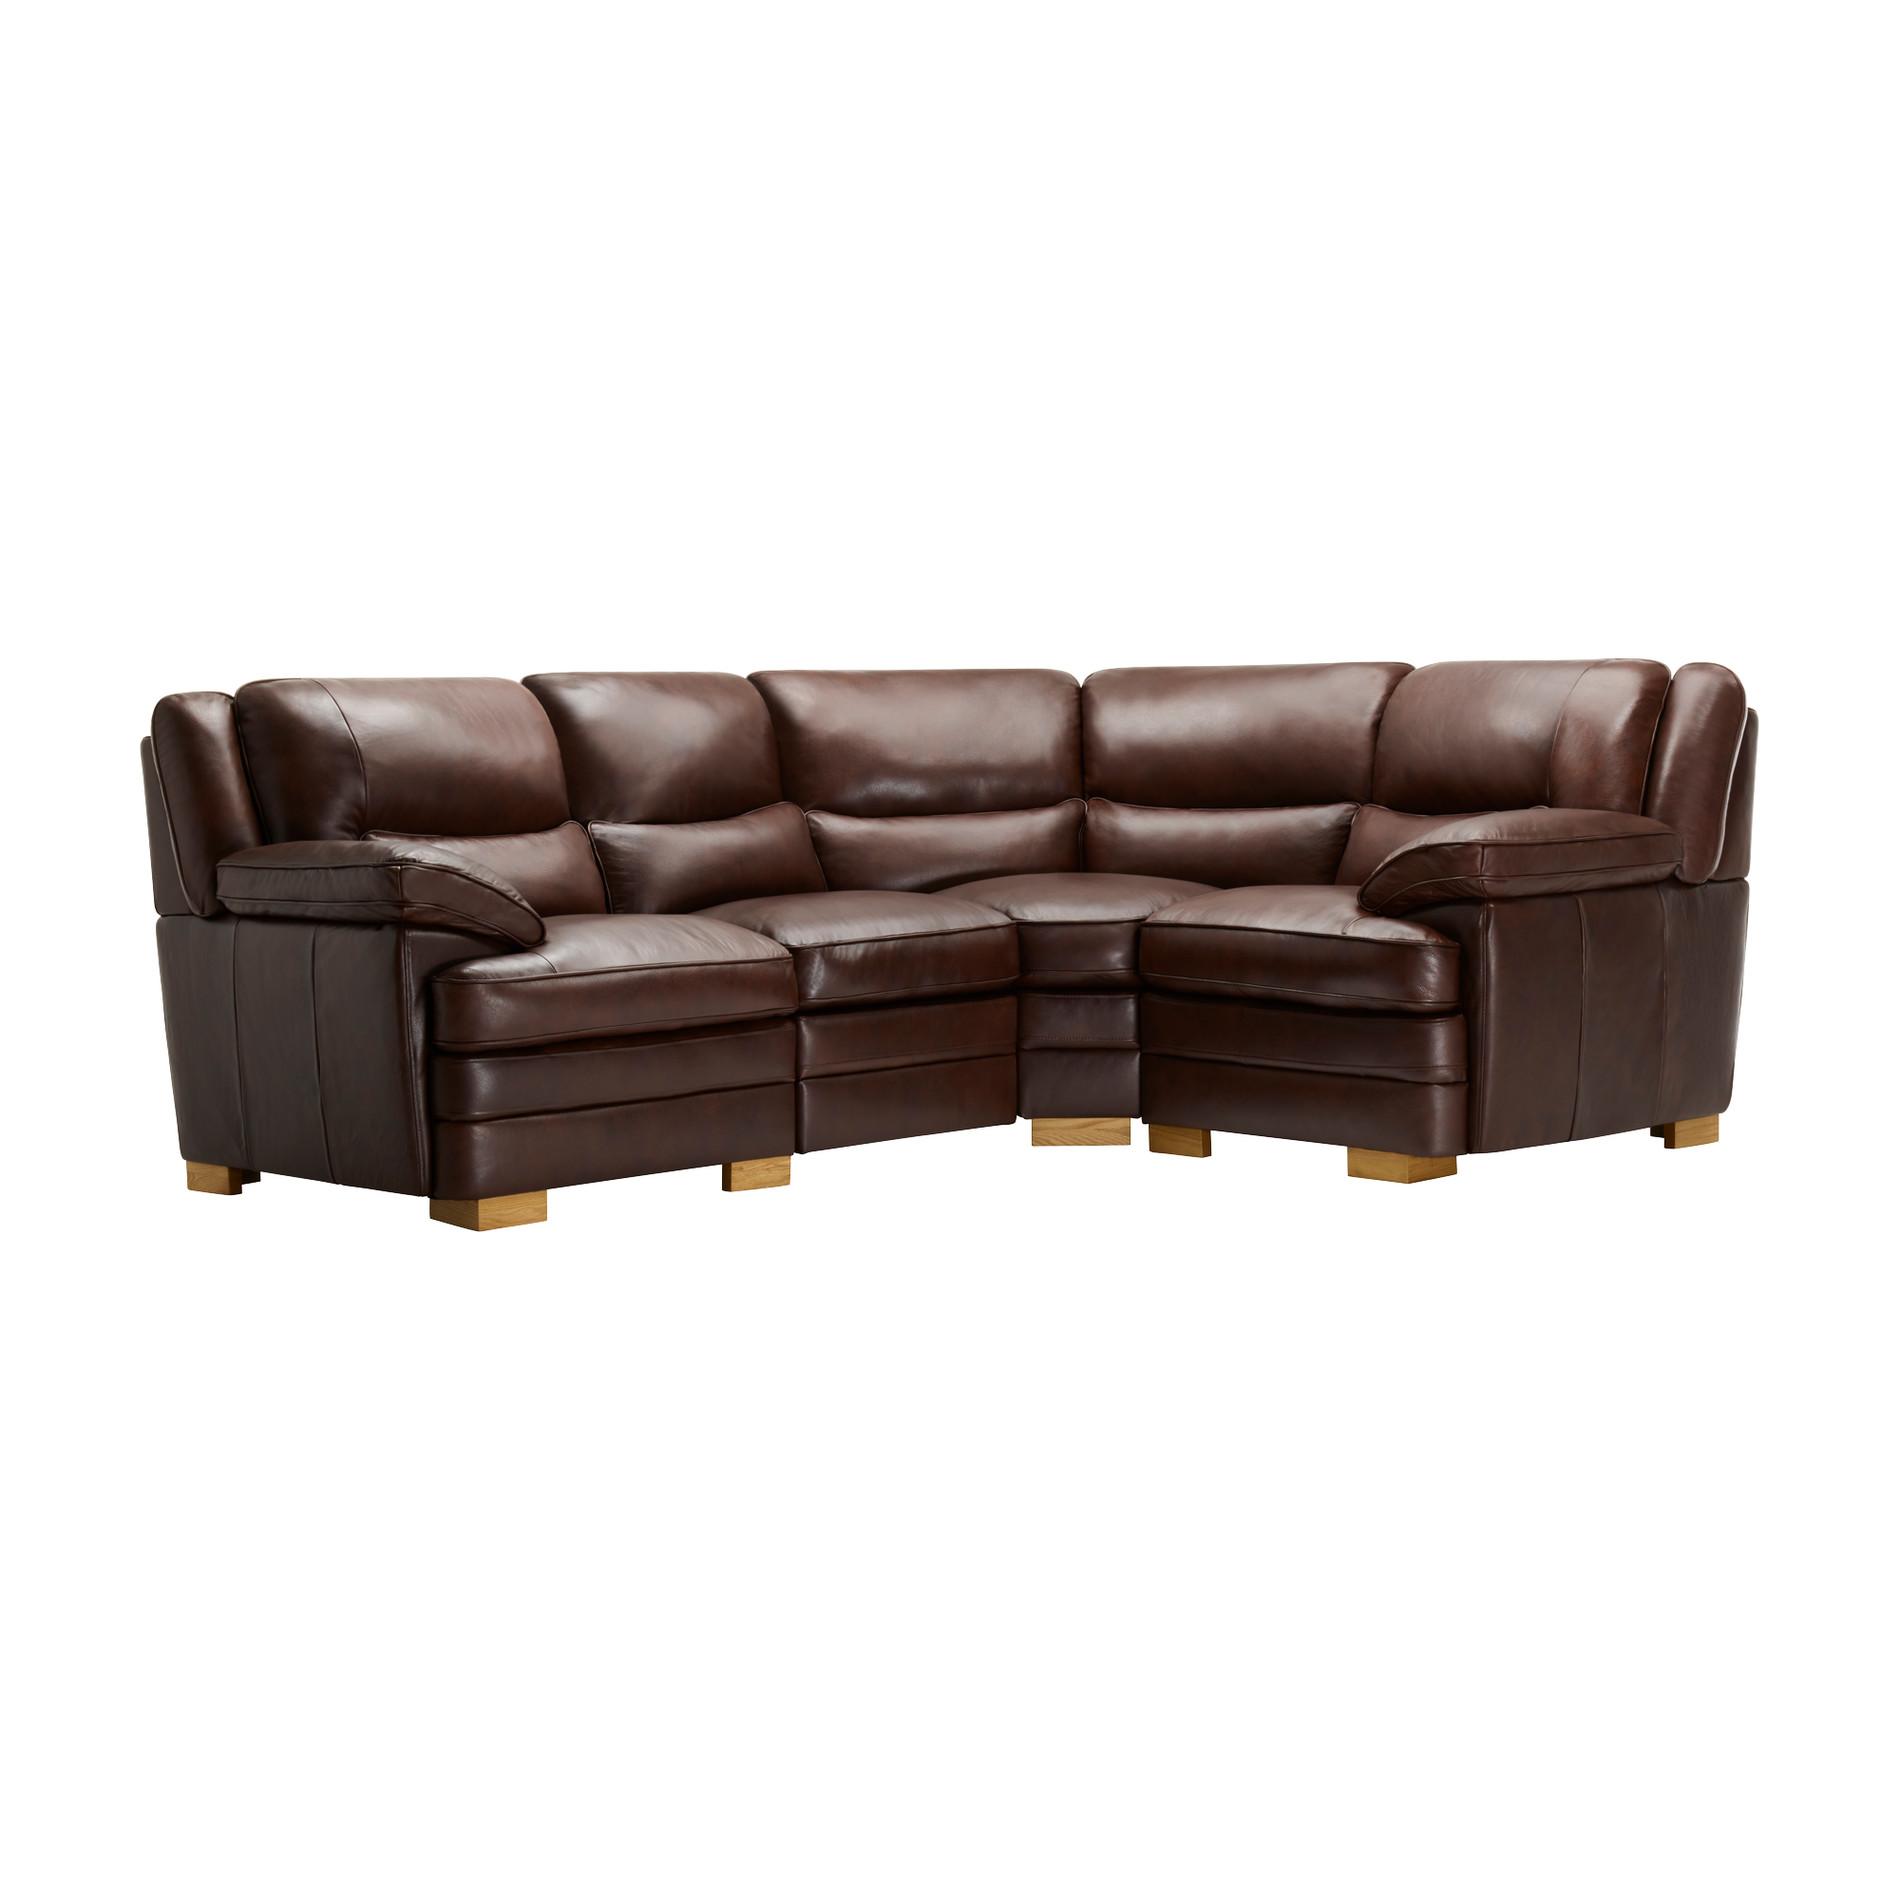 ashley manor harriet sofa in mink wall bed lissoni corner groups uk brokeasshome